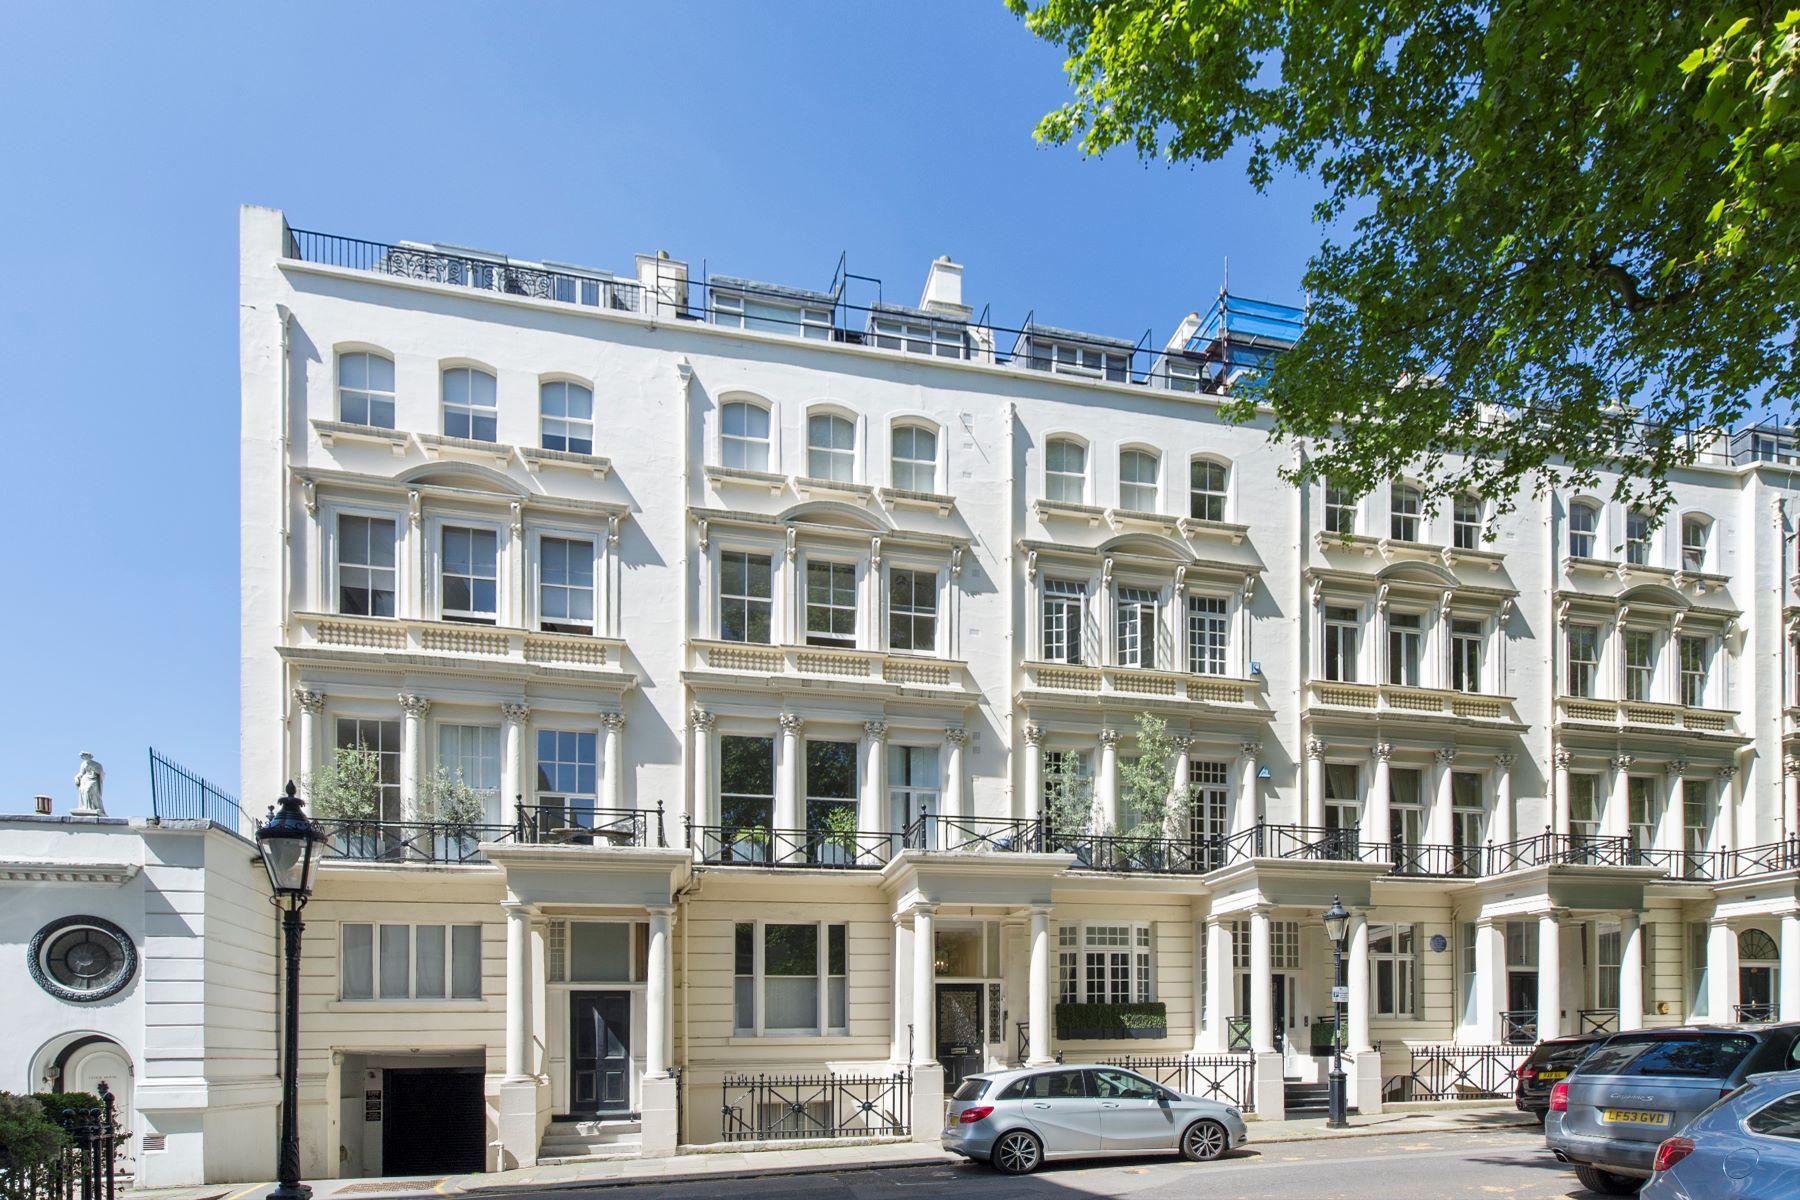 Apartments for Sale at Rutland Gate, Knightsbridge, SW7 Penthouse , 49 Rutland Gate London, England SW7 1PL United Kingdom